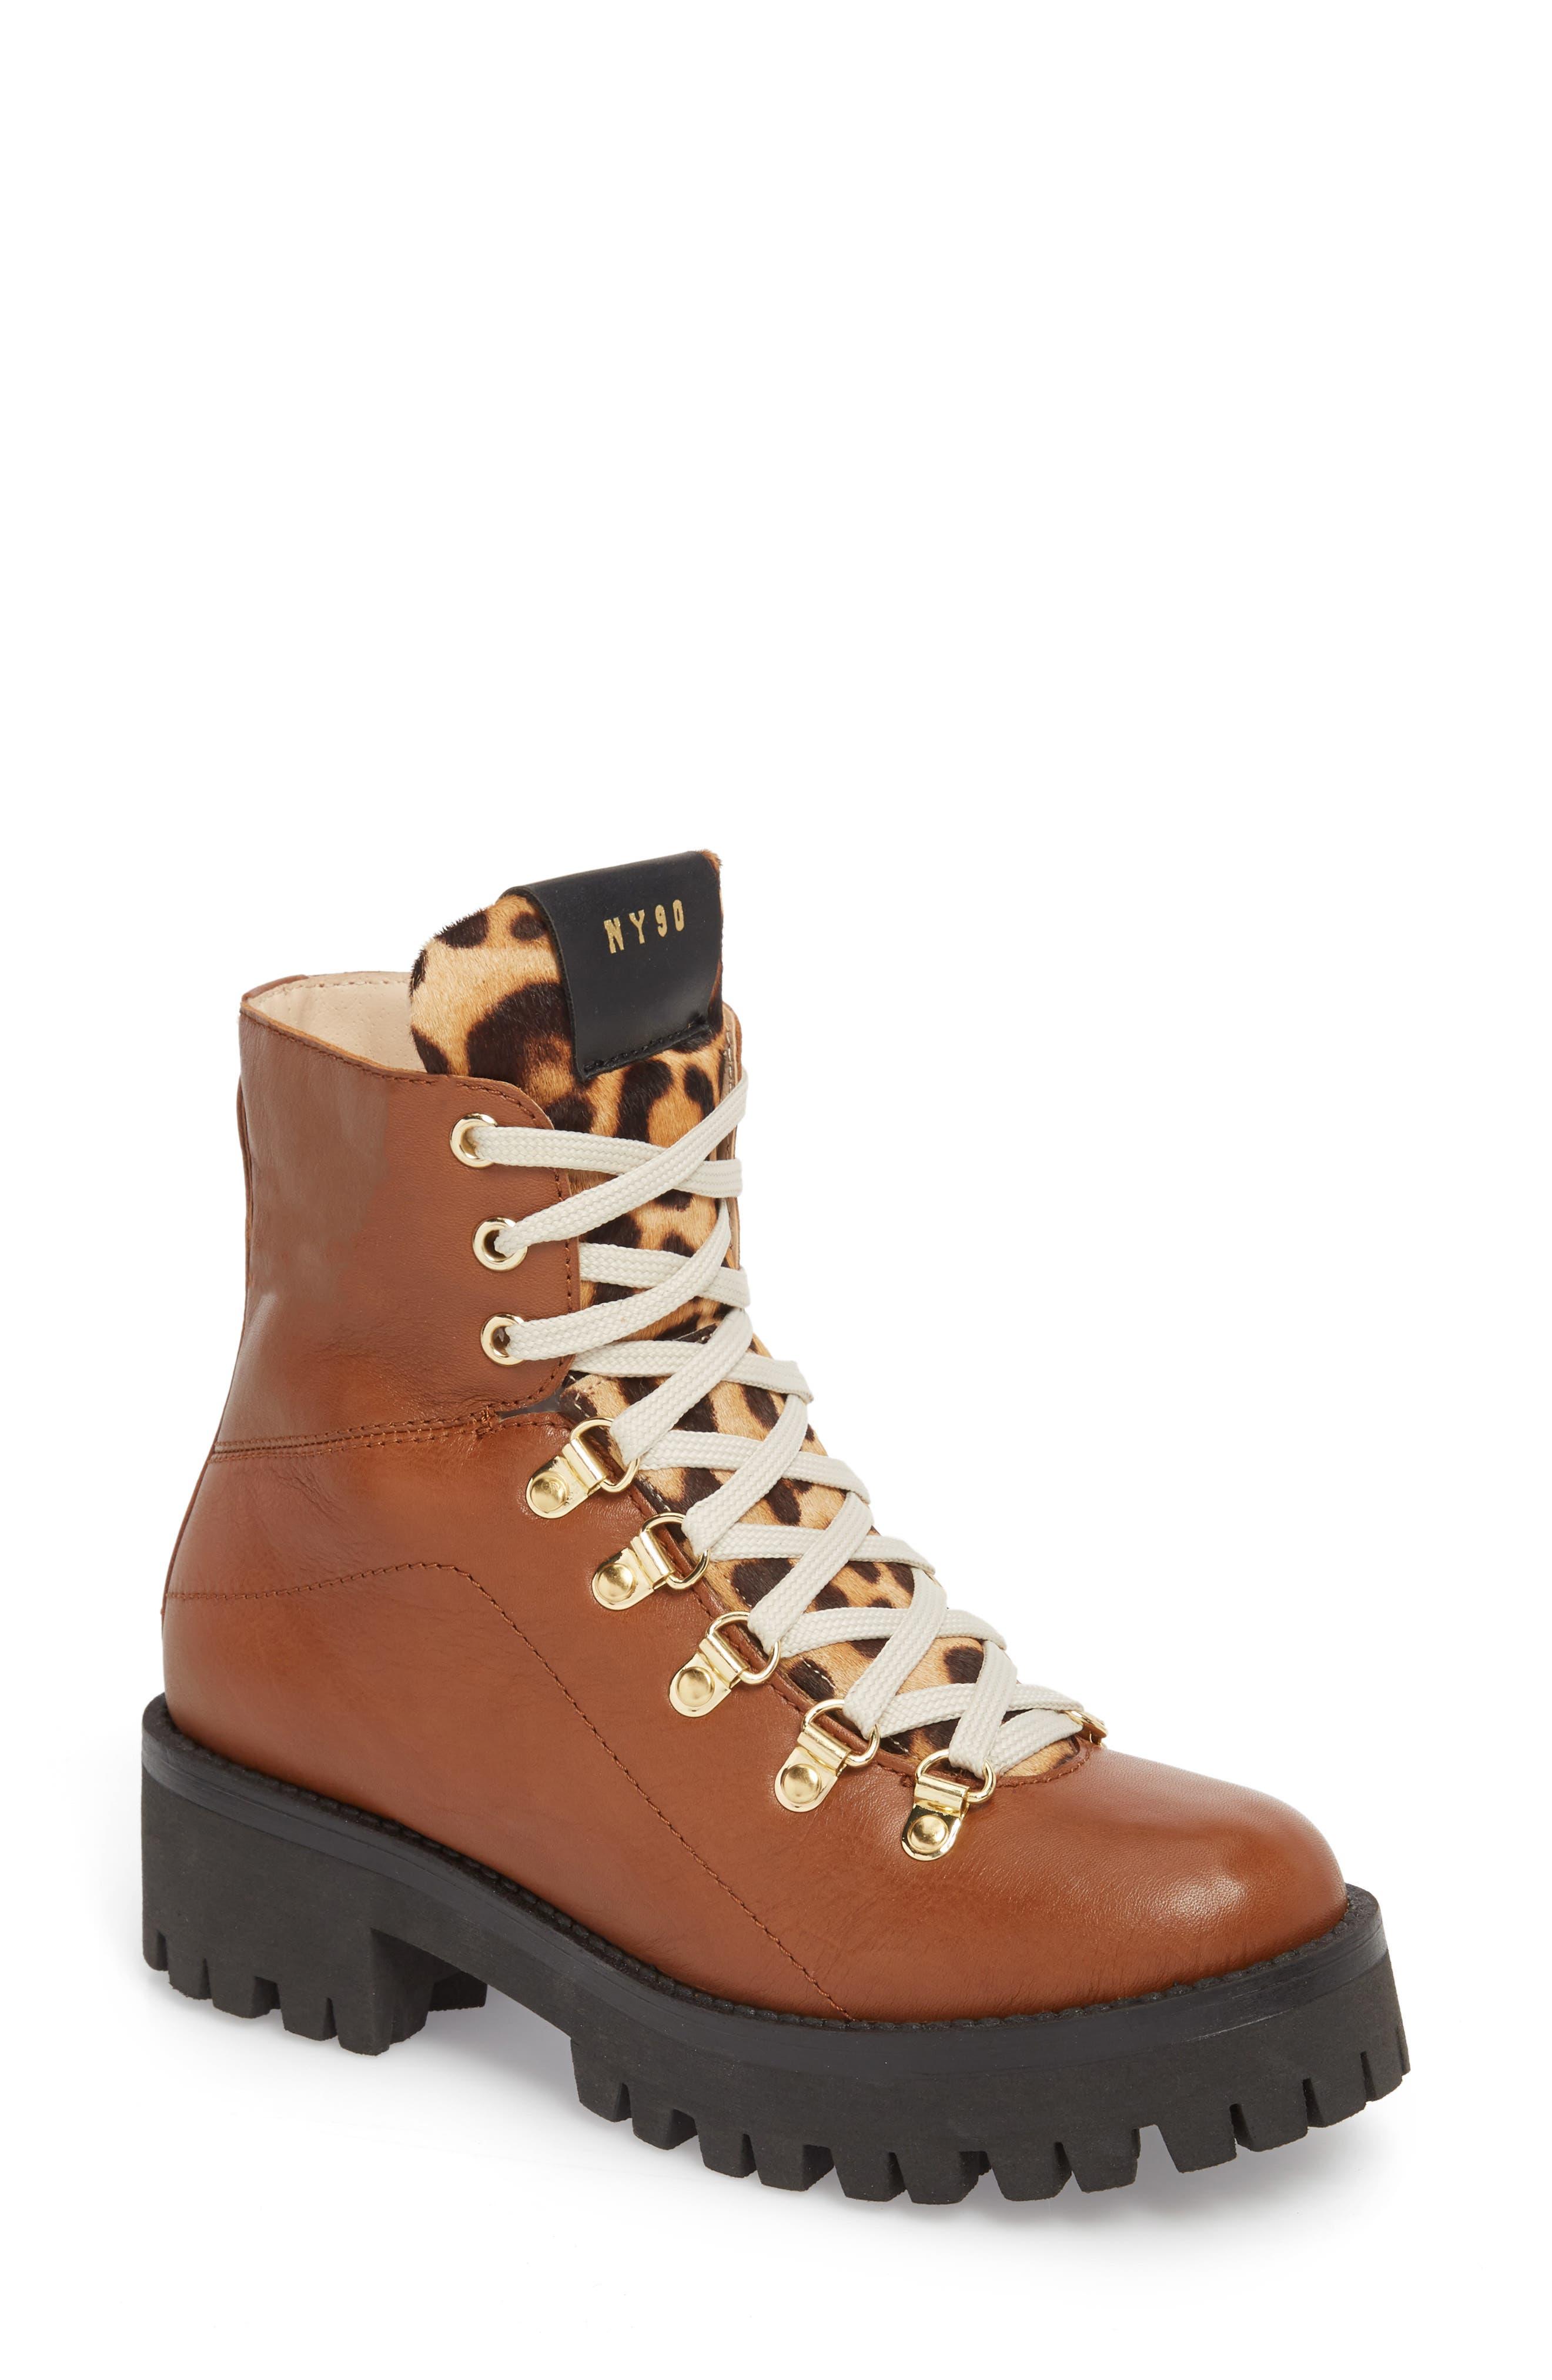 STEVE MADDEN, Boom Hiker Boot with Genuine Calf Hair, Main thumbnail 1, color, 200